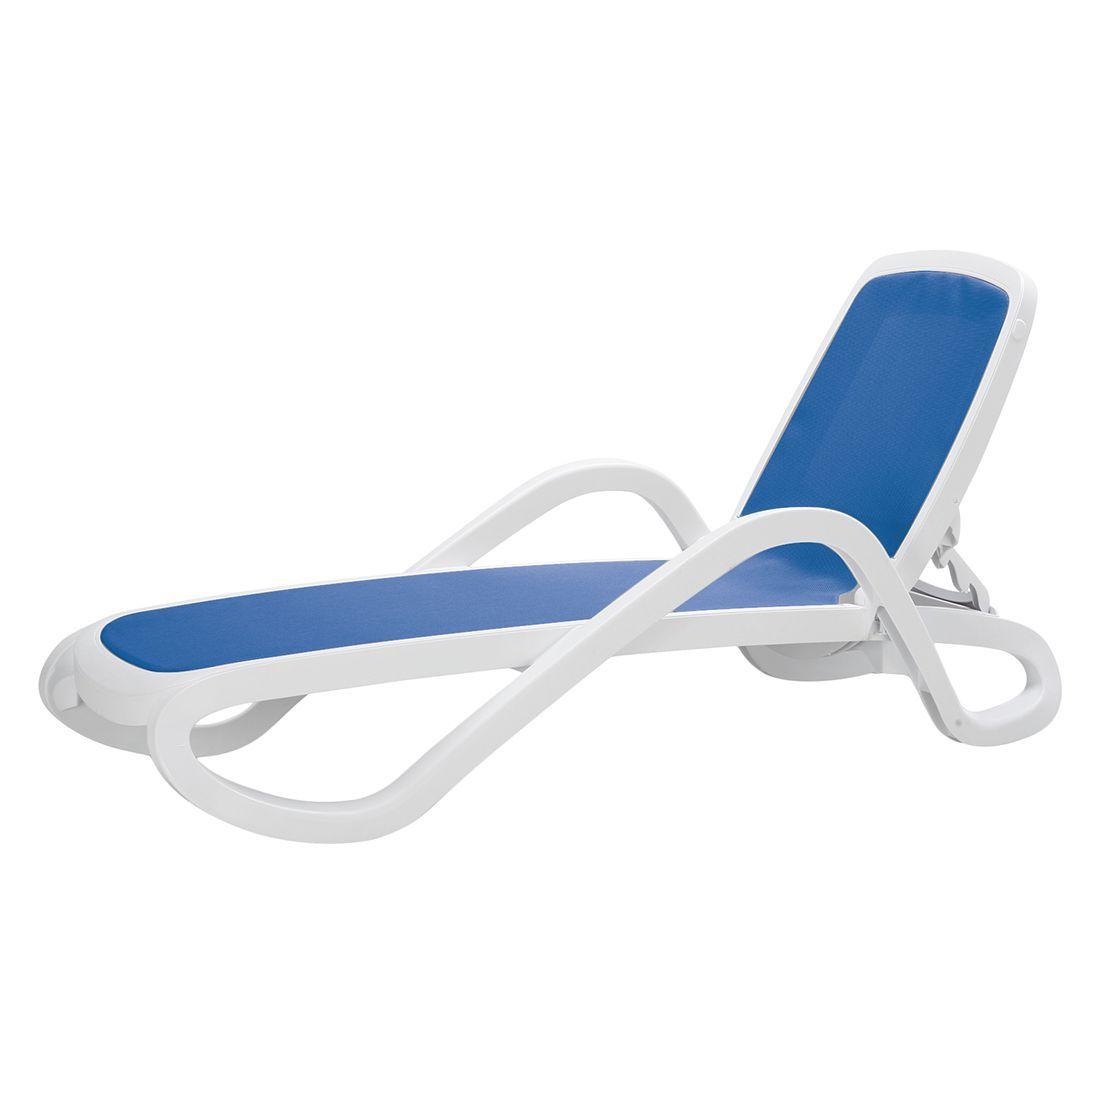 Sonnenliege Tongi Kunststoff Kunstfaser Weiss Blau Best Freizeitmobel Jetzt Bestellen Unter Https Moebel Ladendirekt Gartenliege Sonnenliege Gartenmobel